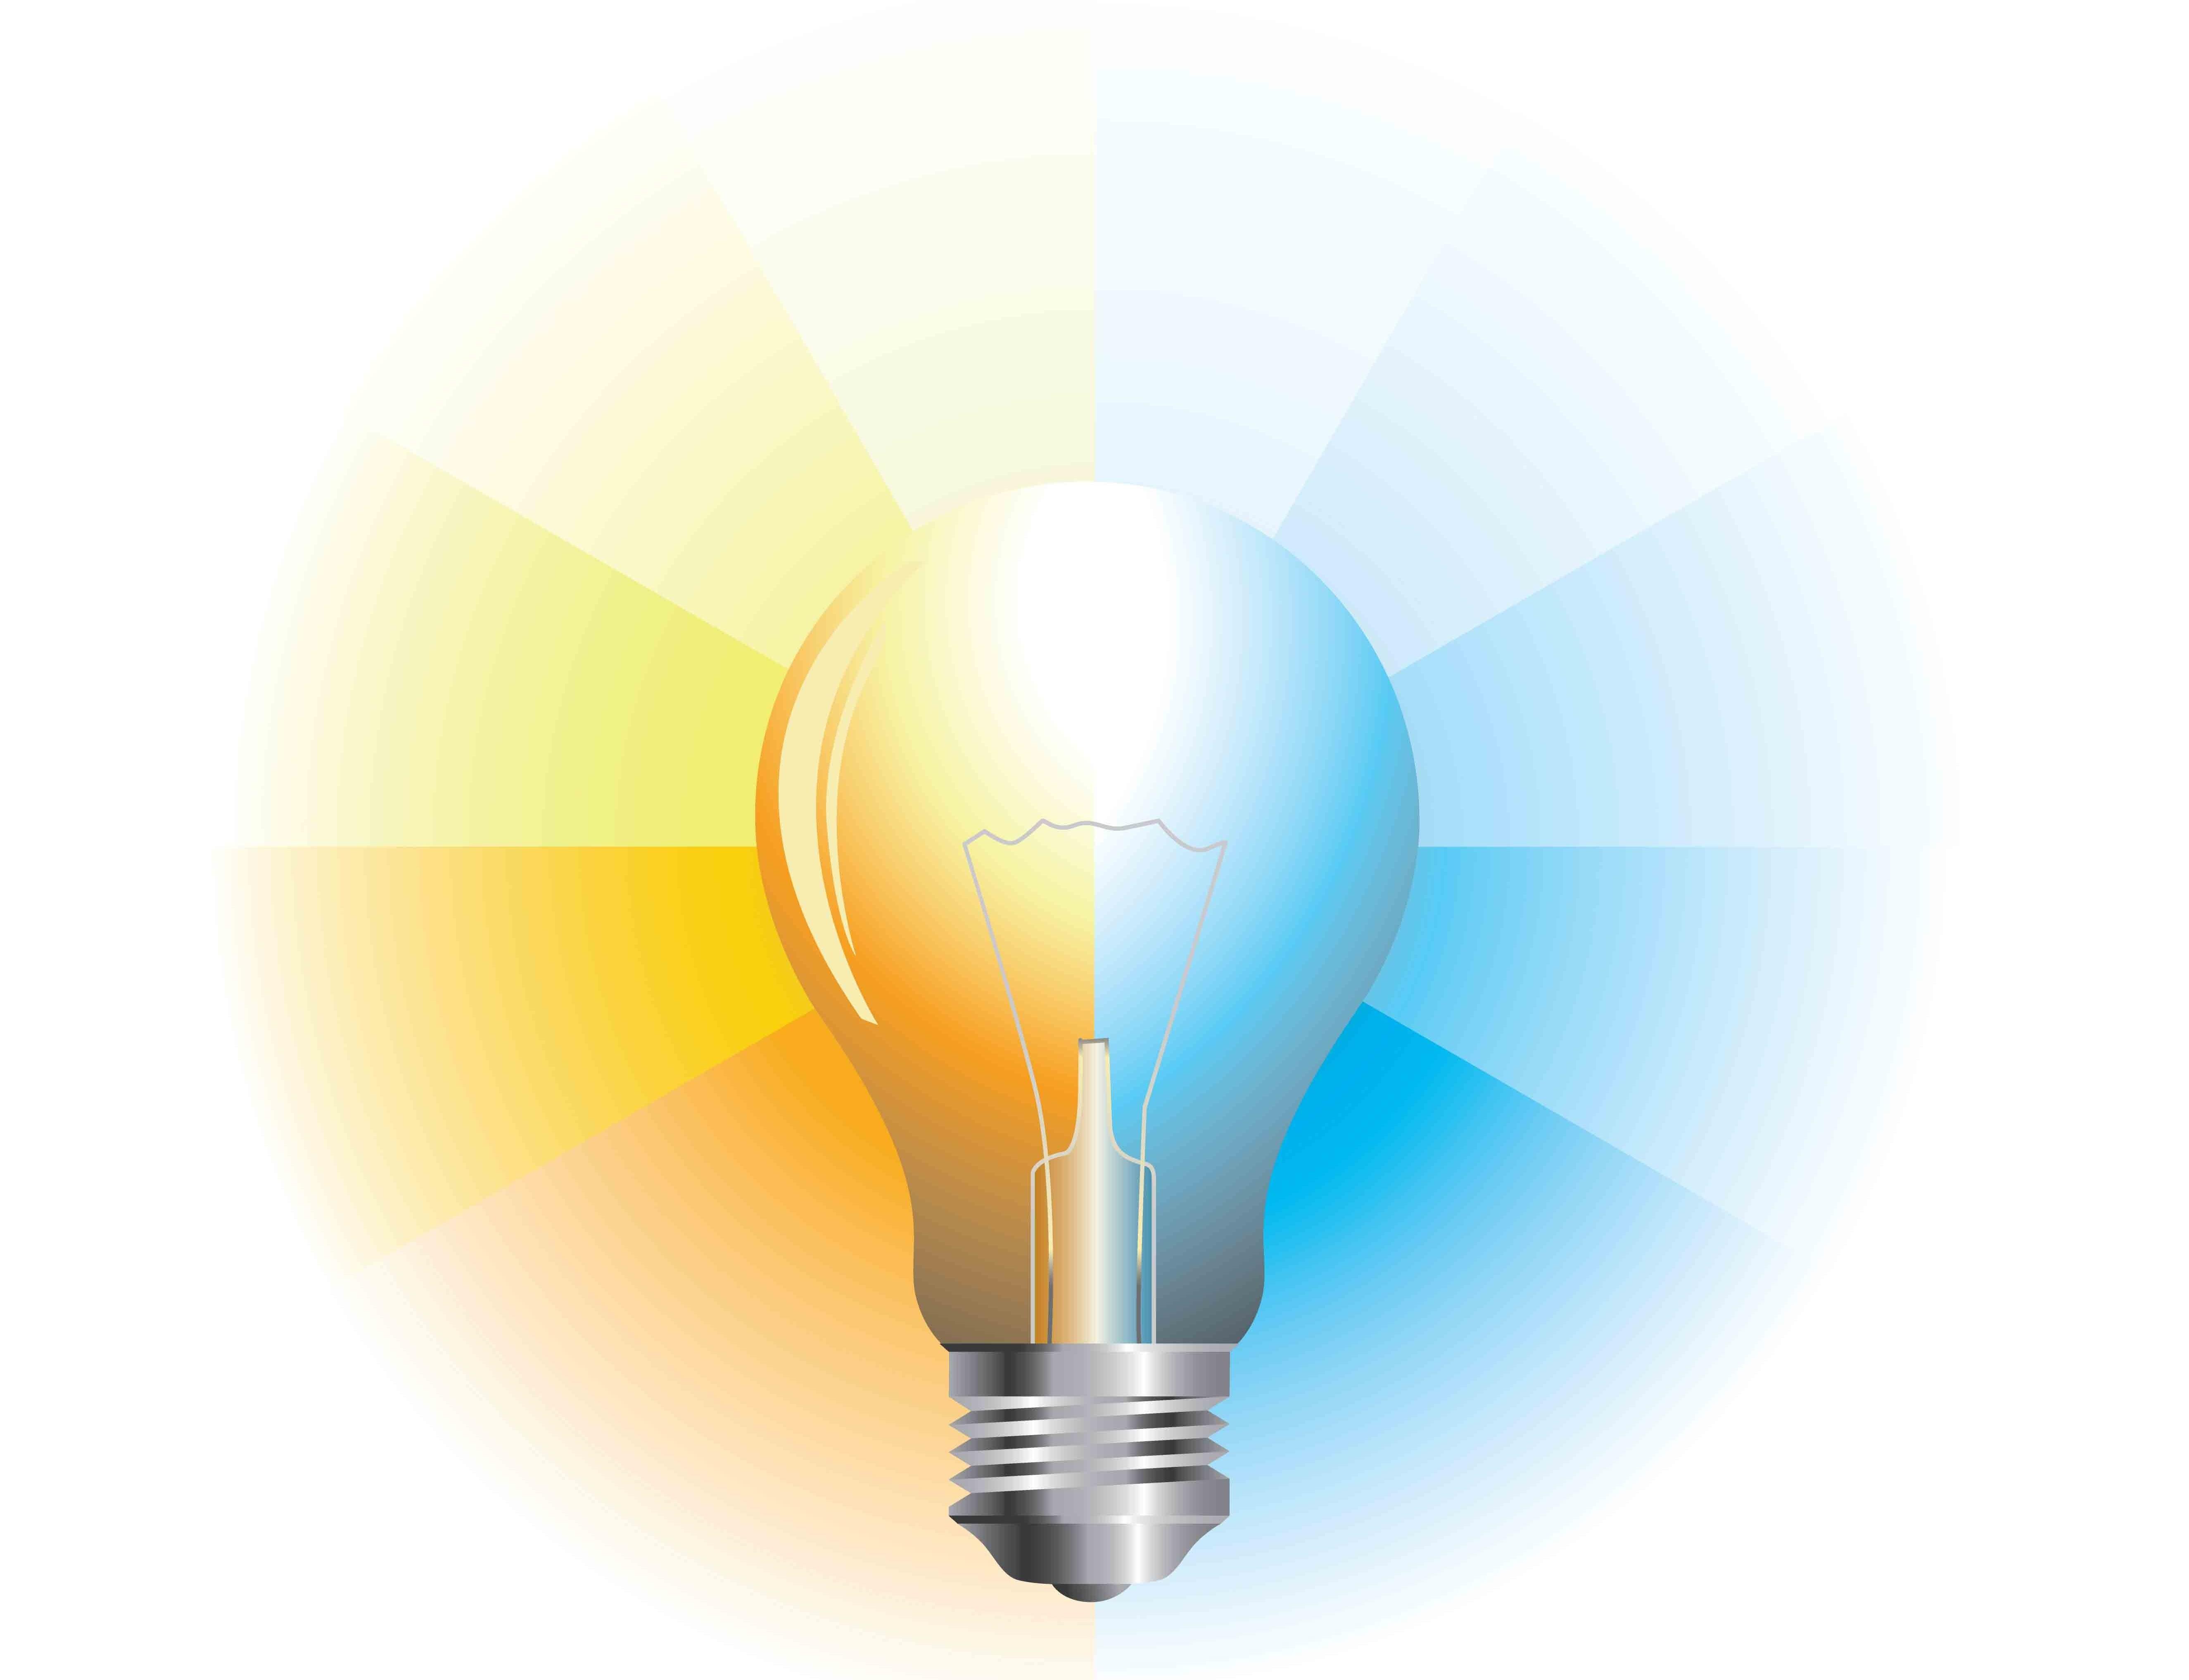 licht & beleuchtung im trend | lampe magazin, Badezimmer ideen